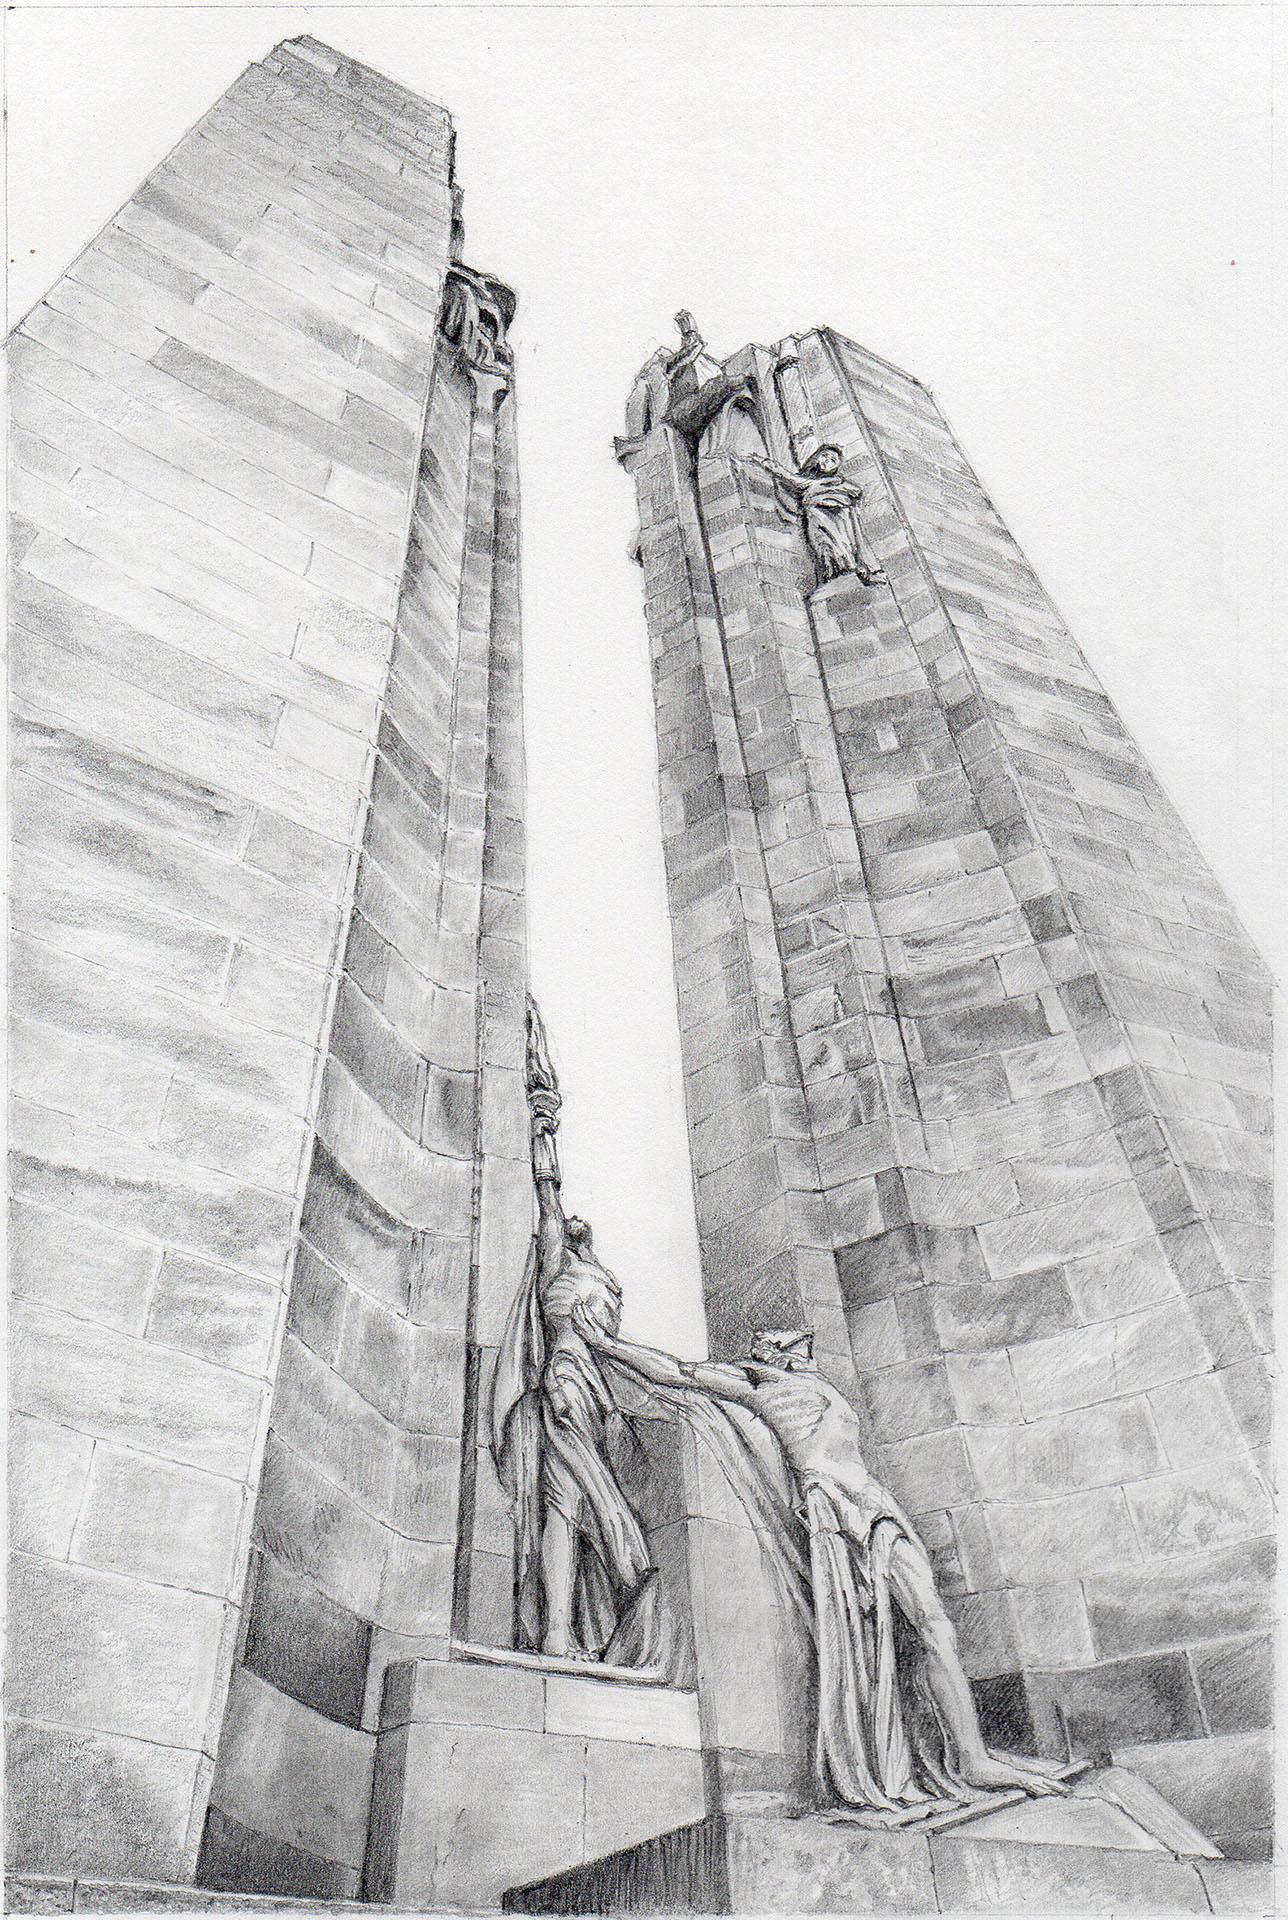 Canadian National Memorial at Vimy Ridge, designed by Walter Seymour Allward